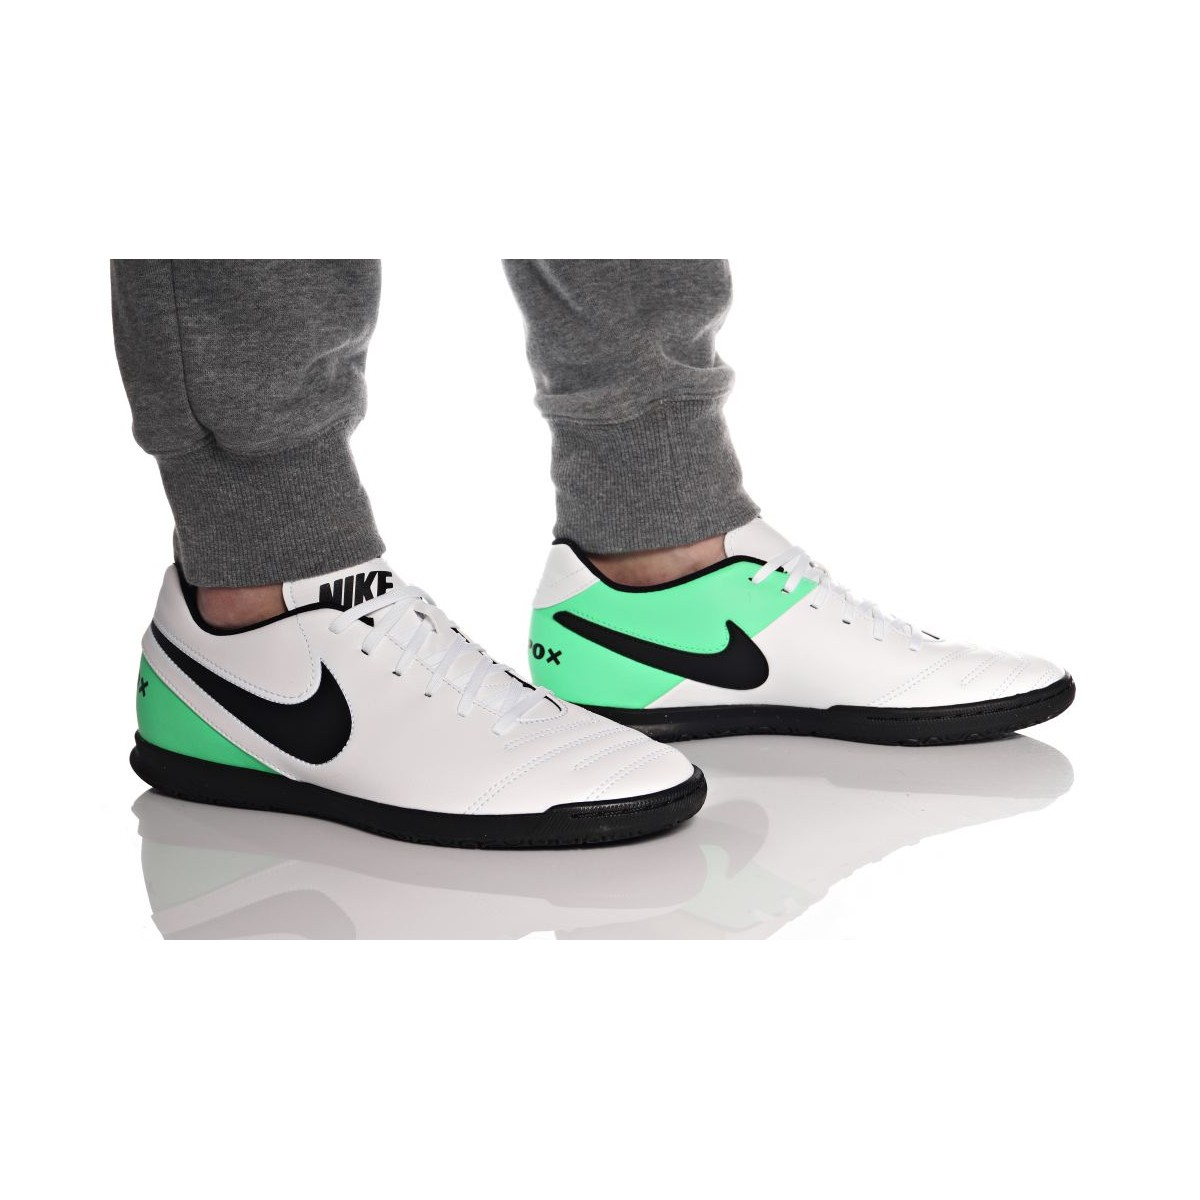 ... Nike Niño TiempoX Rio III IC Fútbol Sala 819234 103 ... 38b106c33aea5